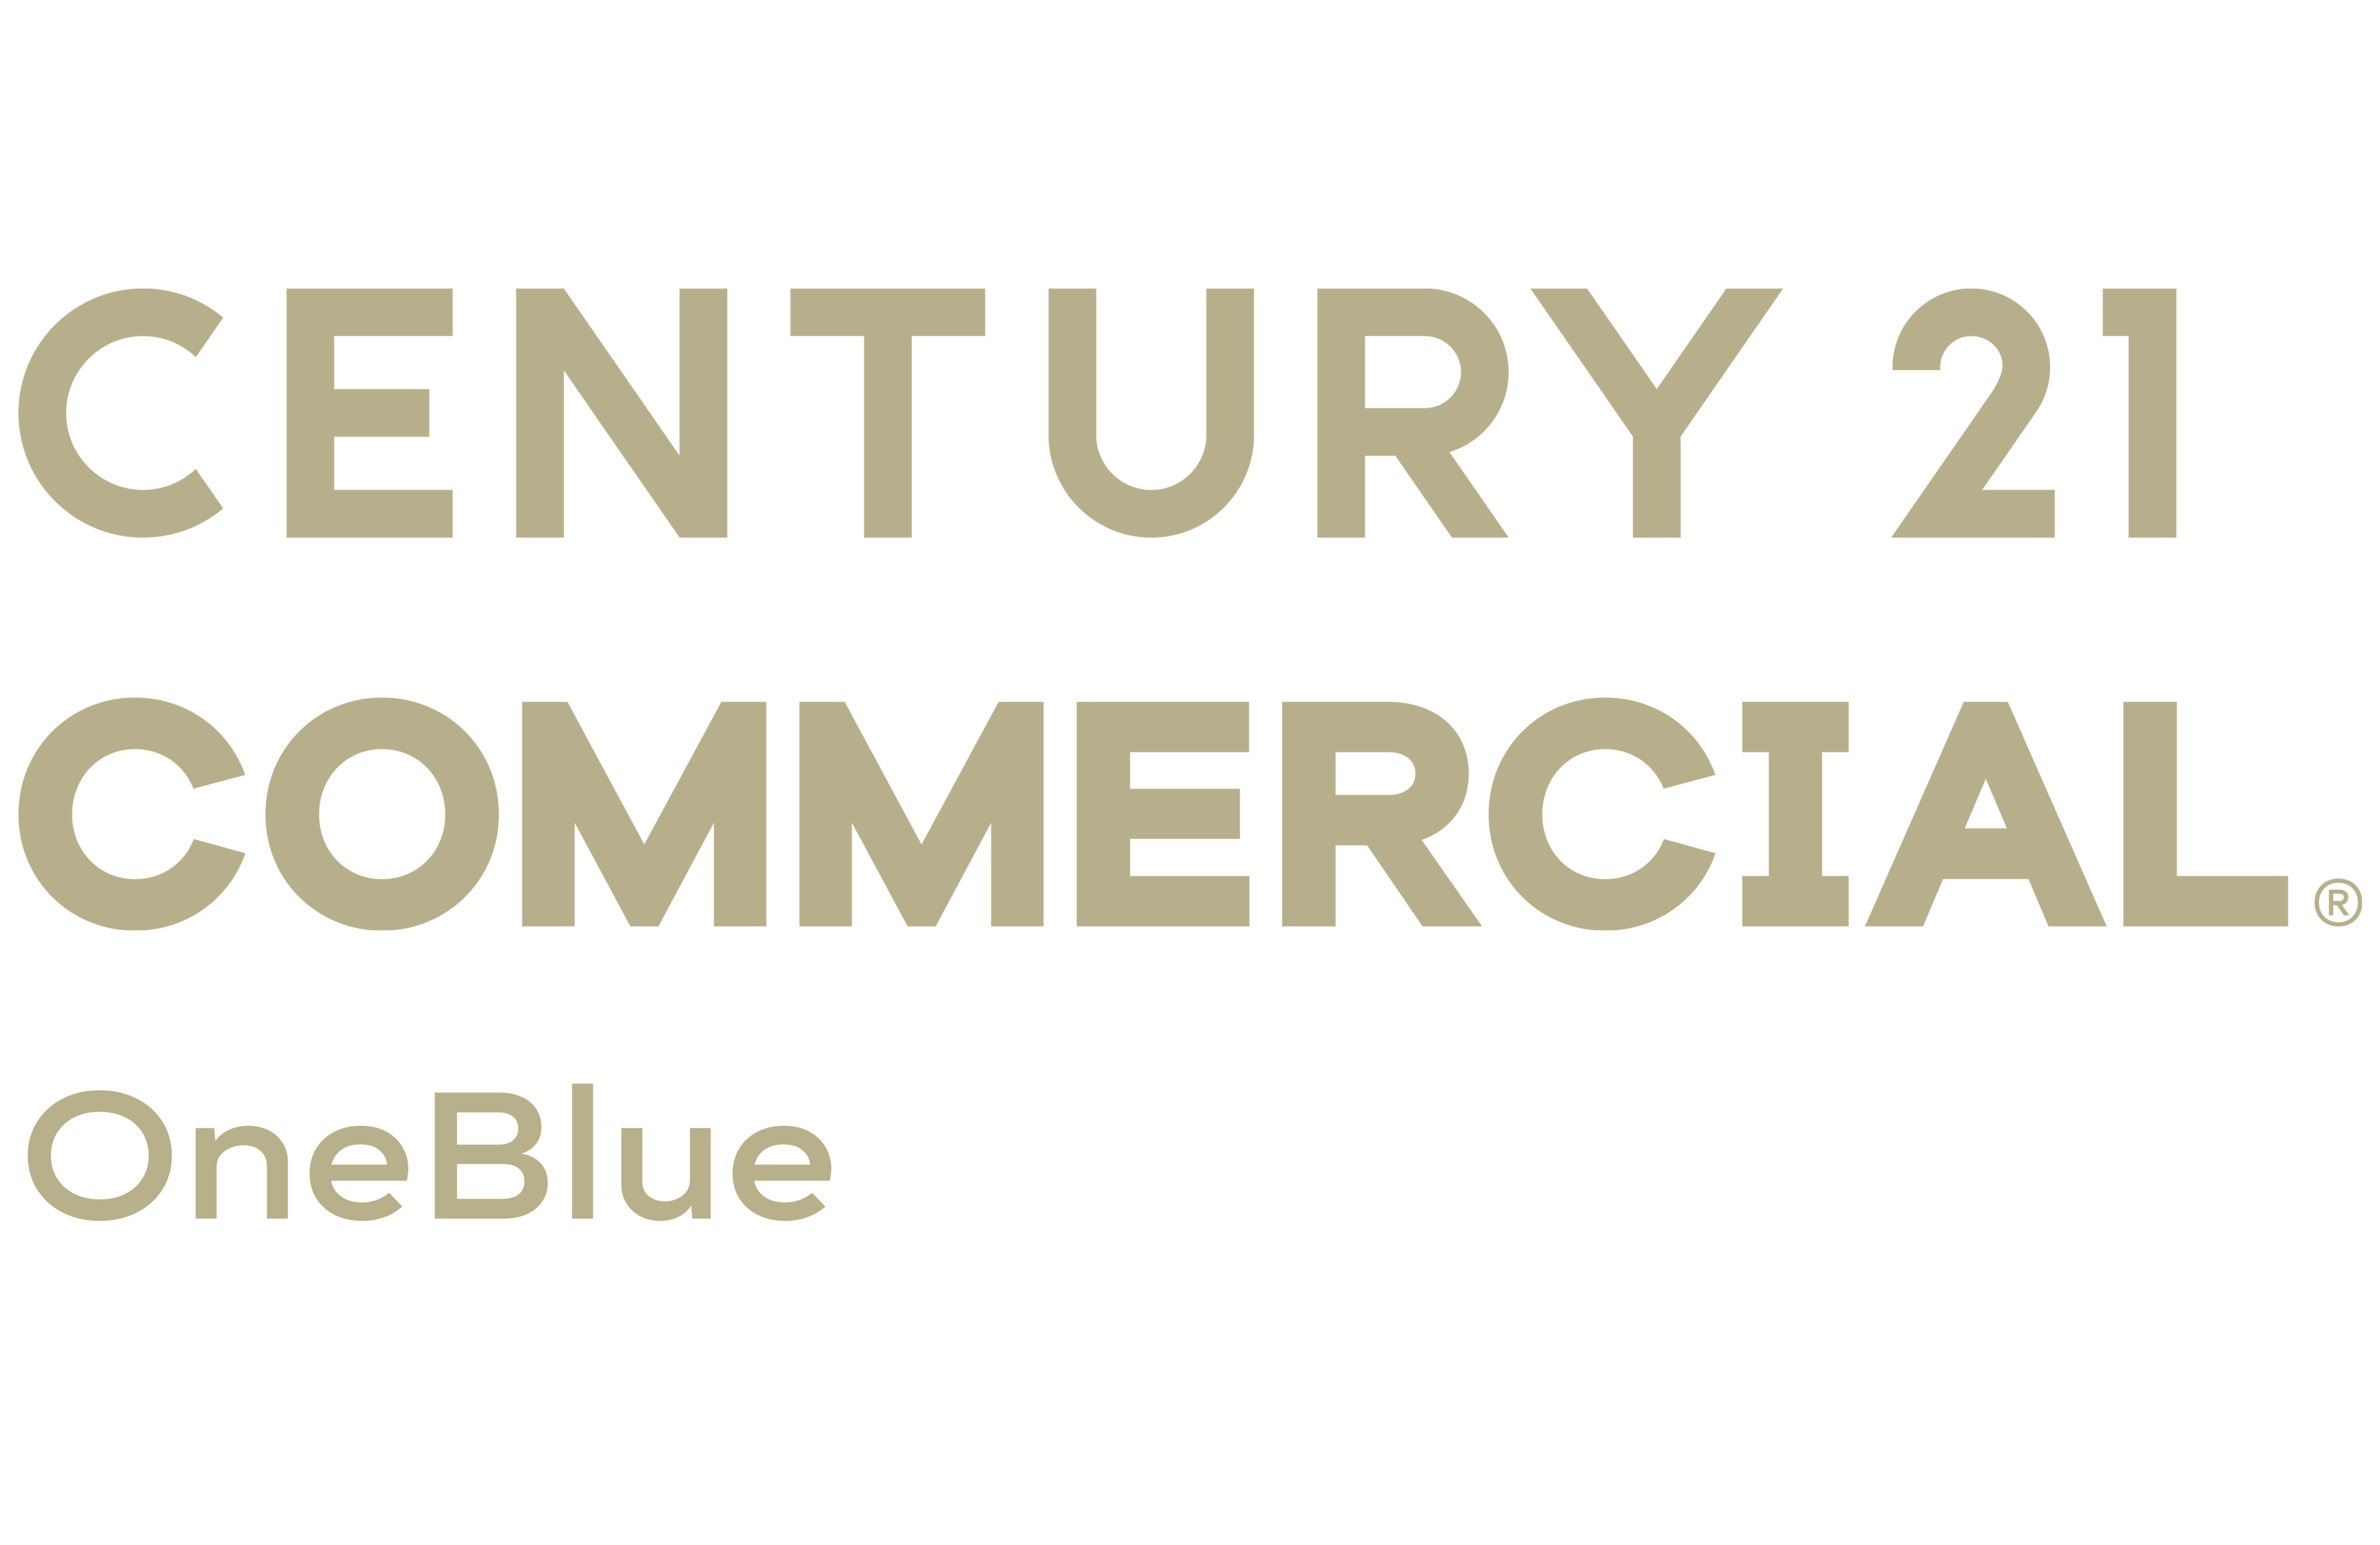 John Carpenter of CENTURY 21 OneBlue logo